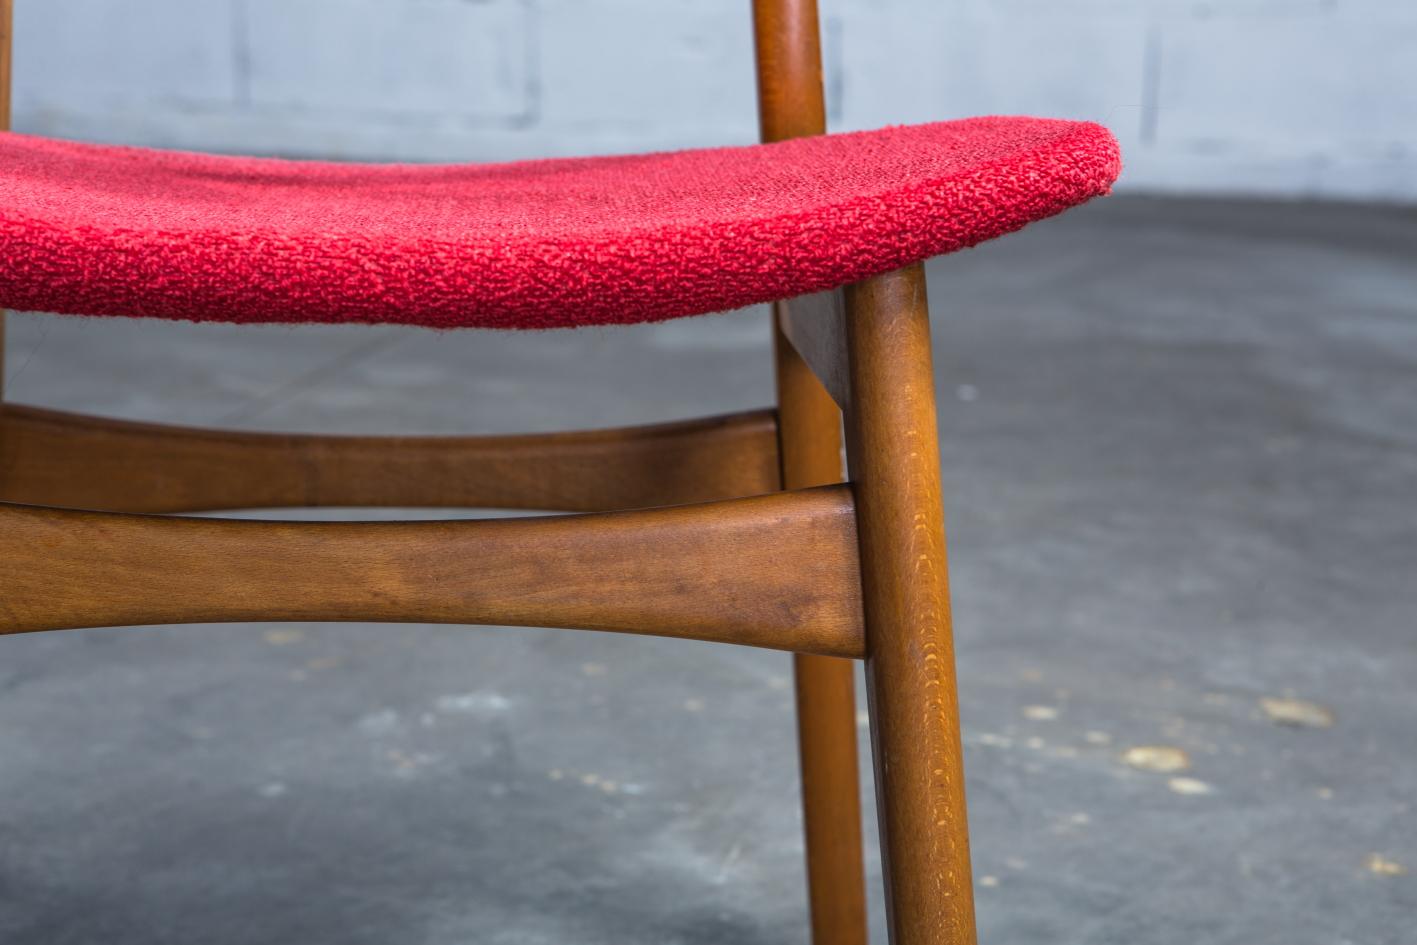 CH 30 chairs - Hans J. Wegner for Carl Hansen - Legs